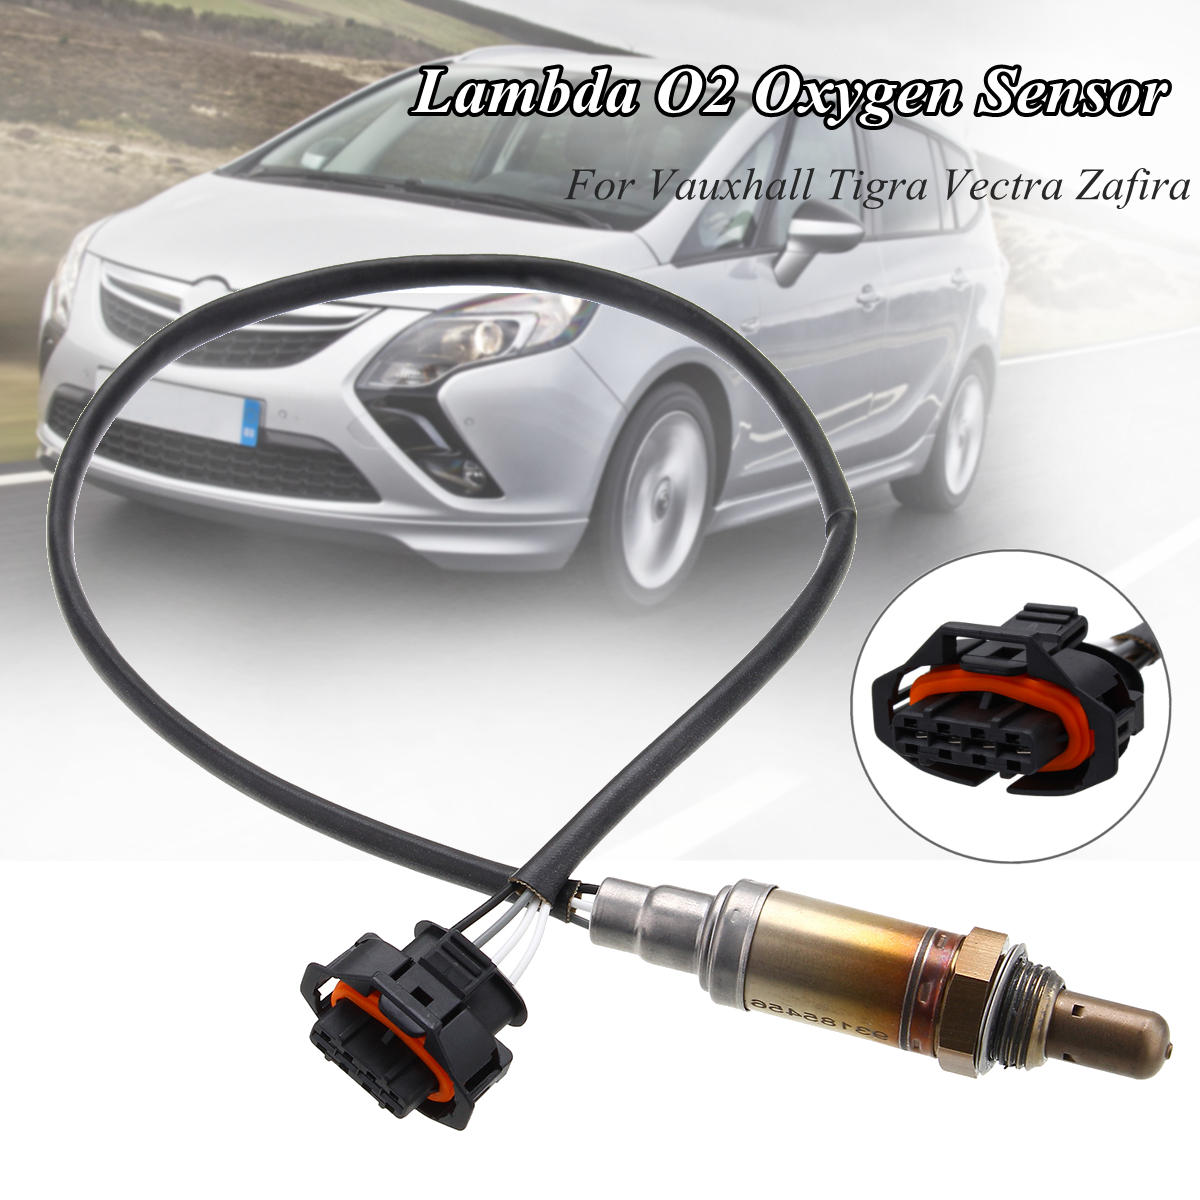 Lambda O2 Oxygen Sensor For Vauxhall Tigra Vectra Zafira 1.8 16v 93185456Lambda O2 Oxygen Sensor For Vauxhall Tigra Vectra Zafira 1.8 16v 93185456